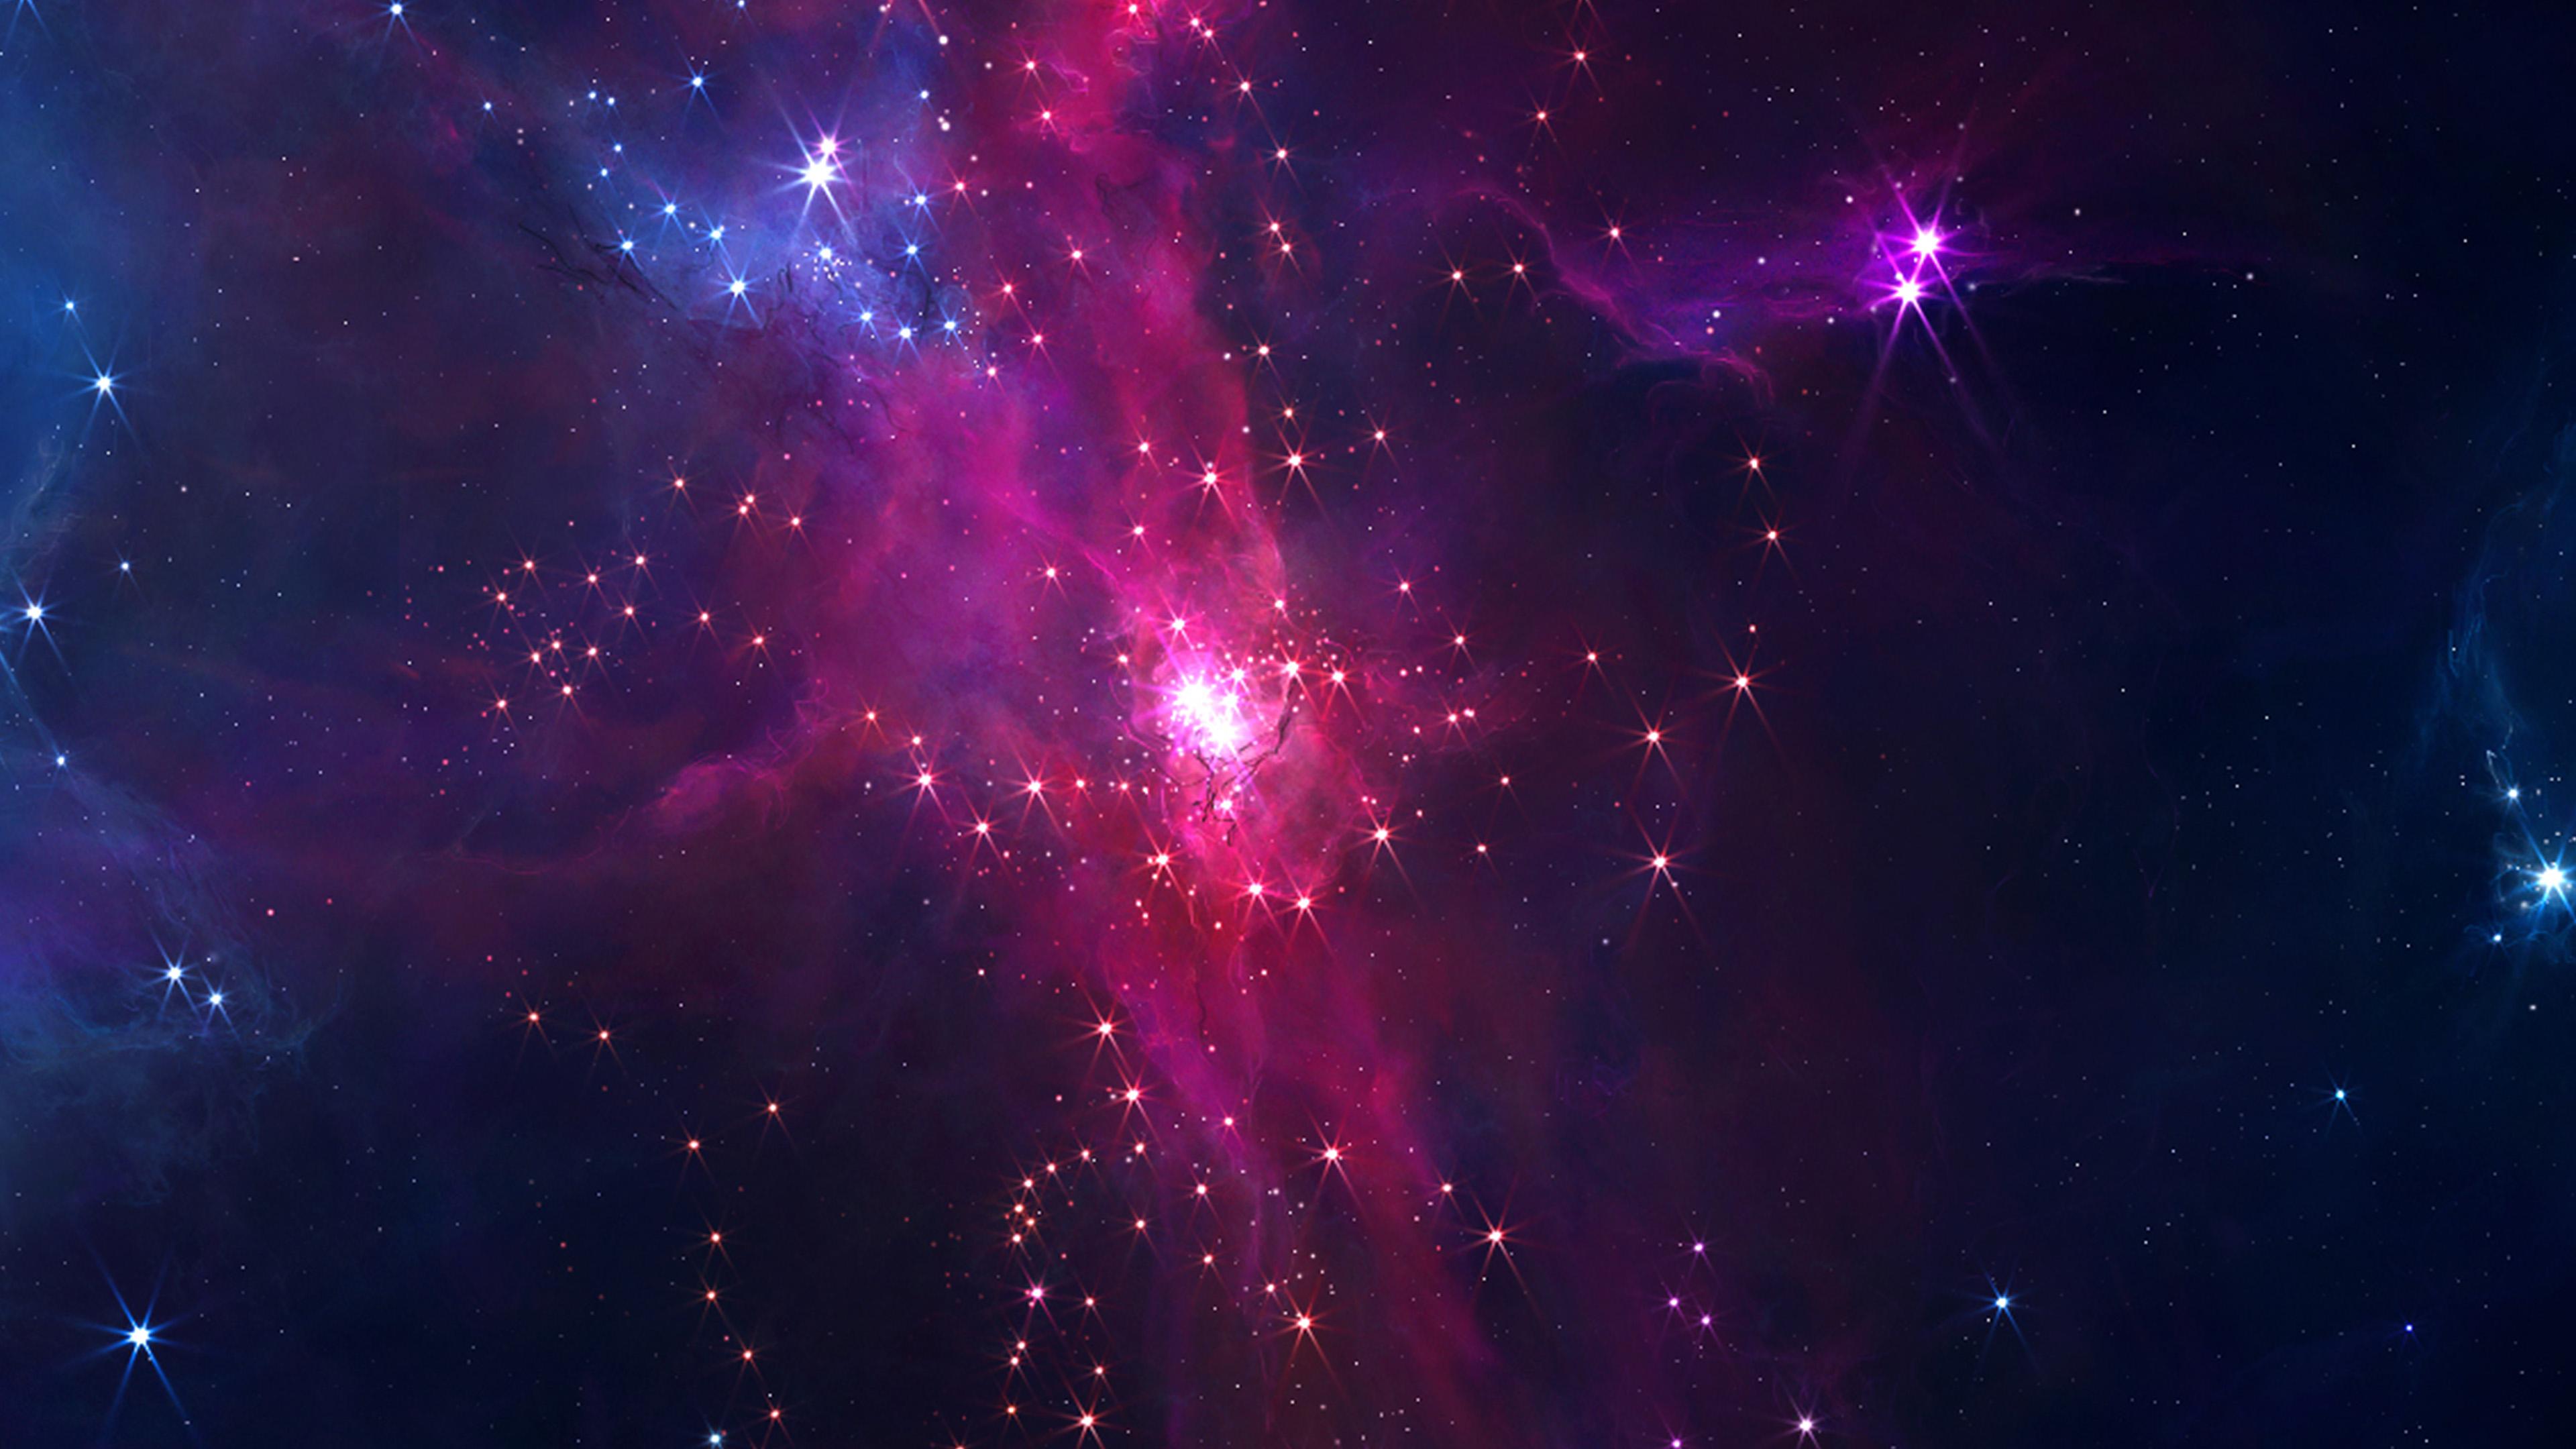 Live Photo Wallpaper Iphone Se Bc68 Space Star Red Blue Dark Sky Art Illustration Wallpaper